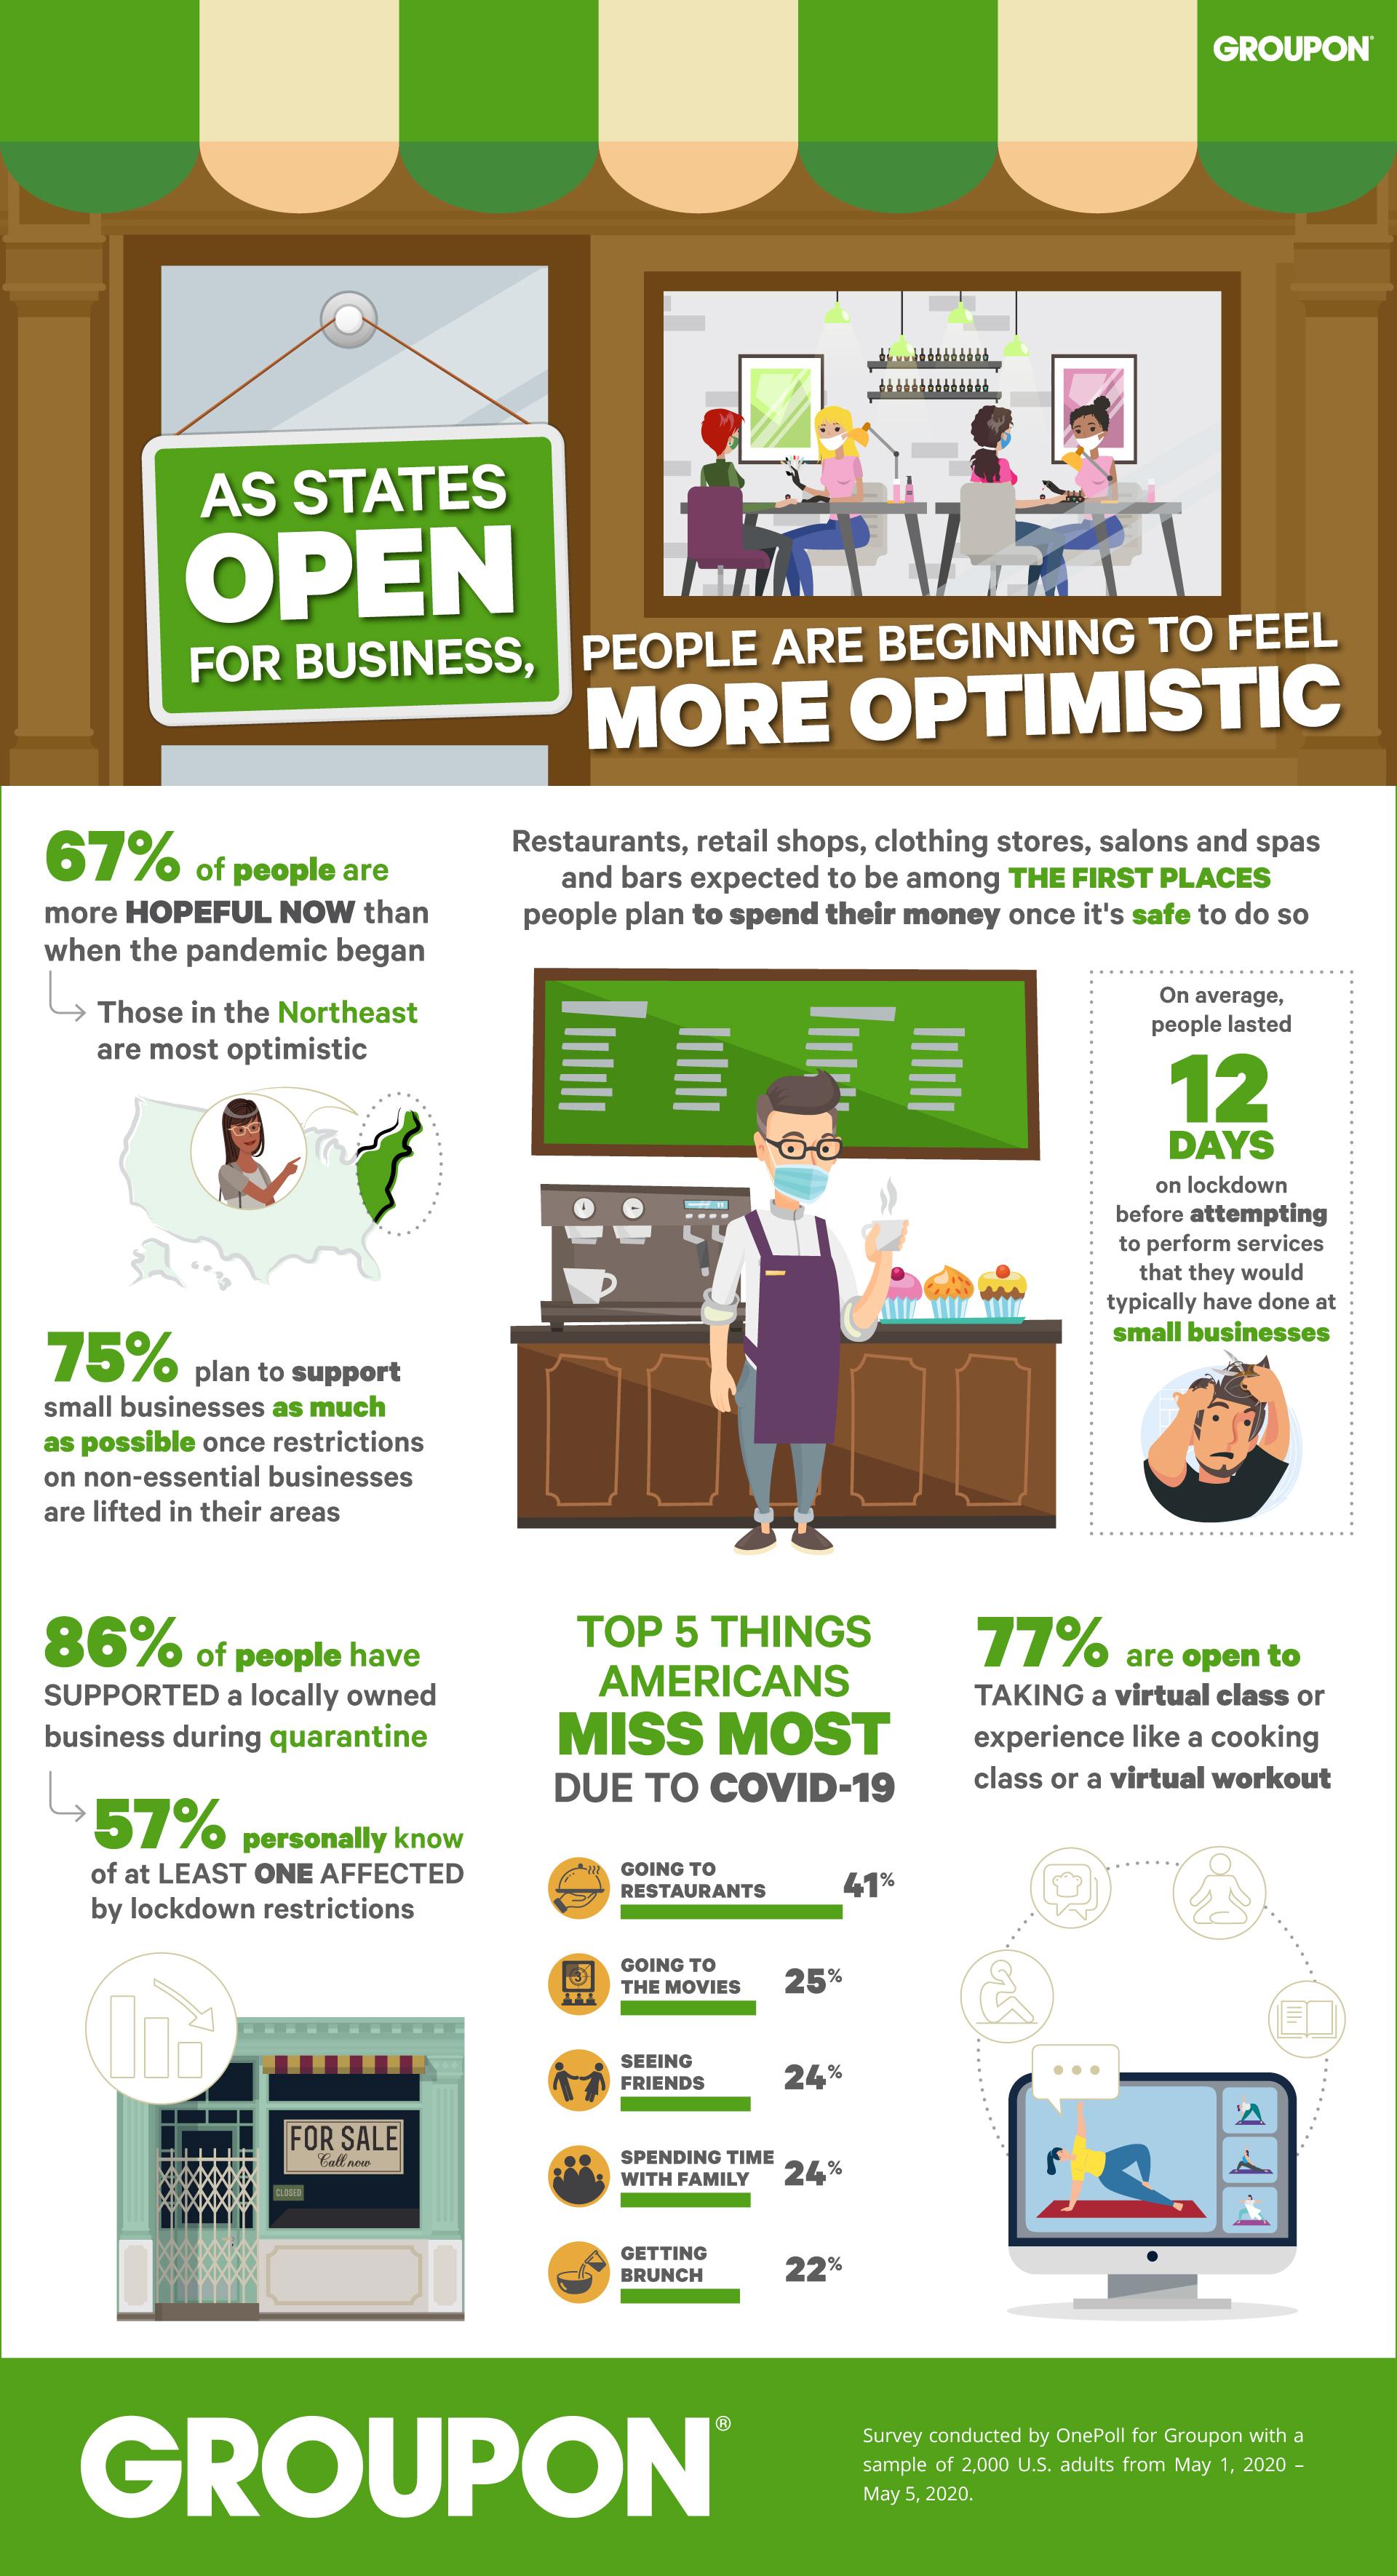 GroupOn Consumer Plans Survey